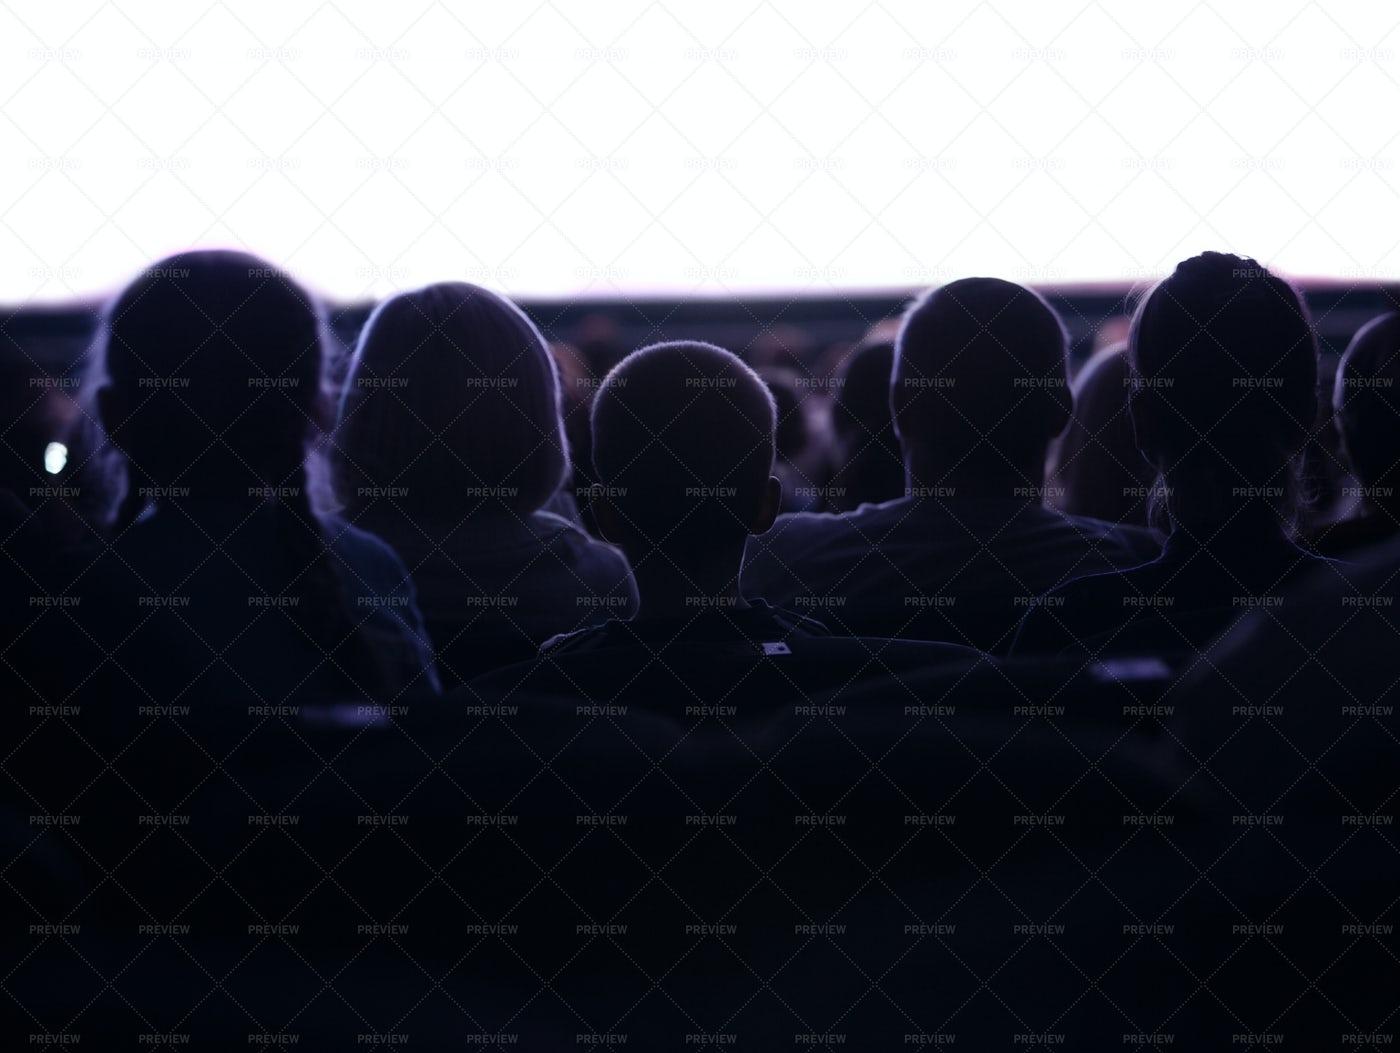 People Watching Cinema: Stock Photos